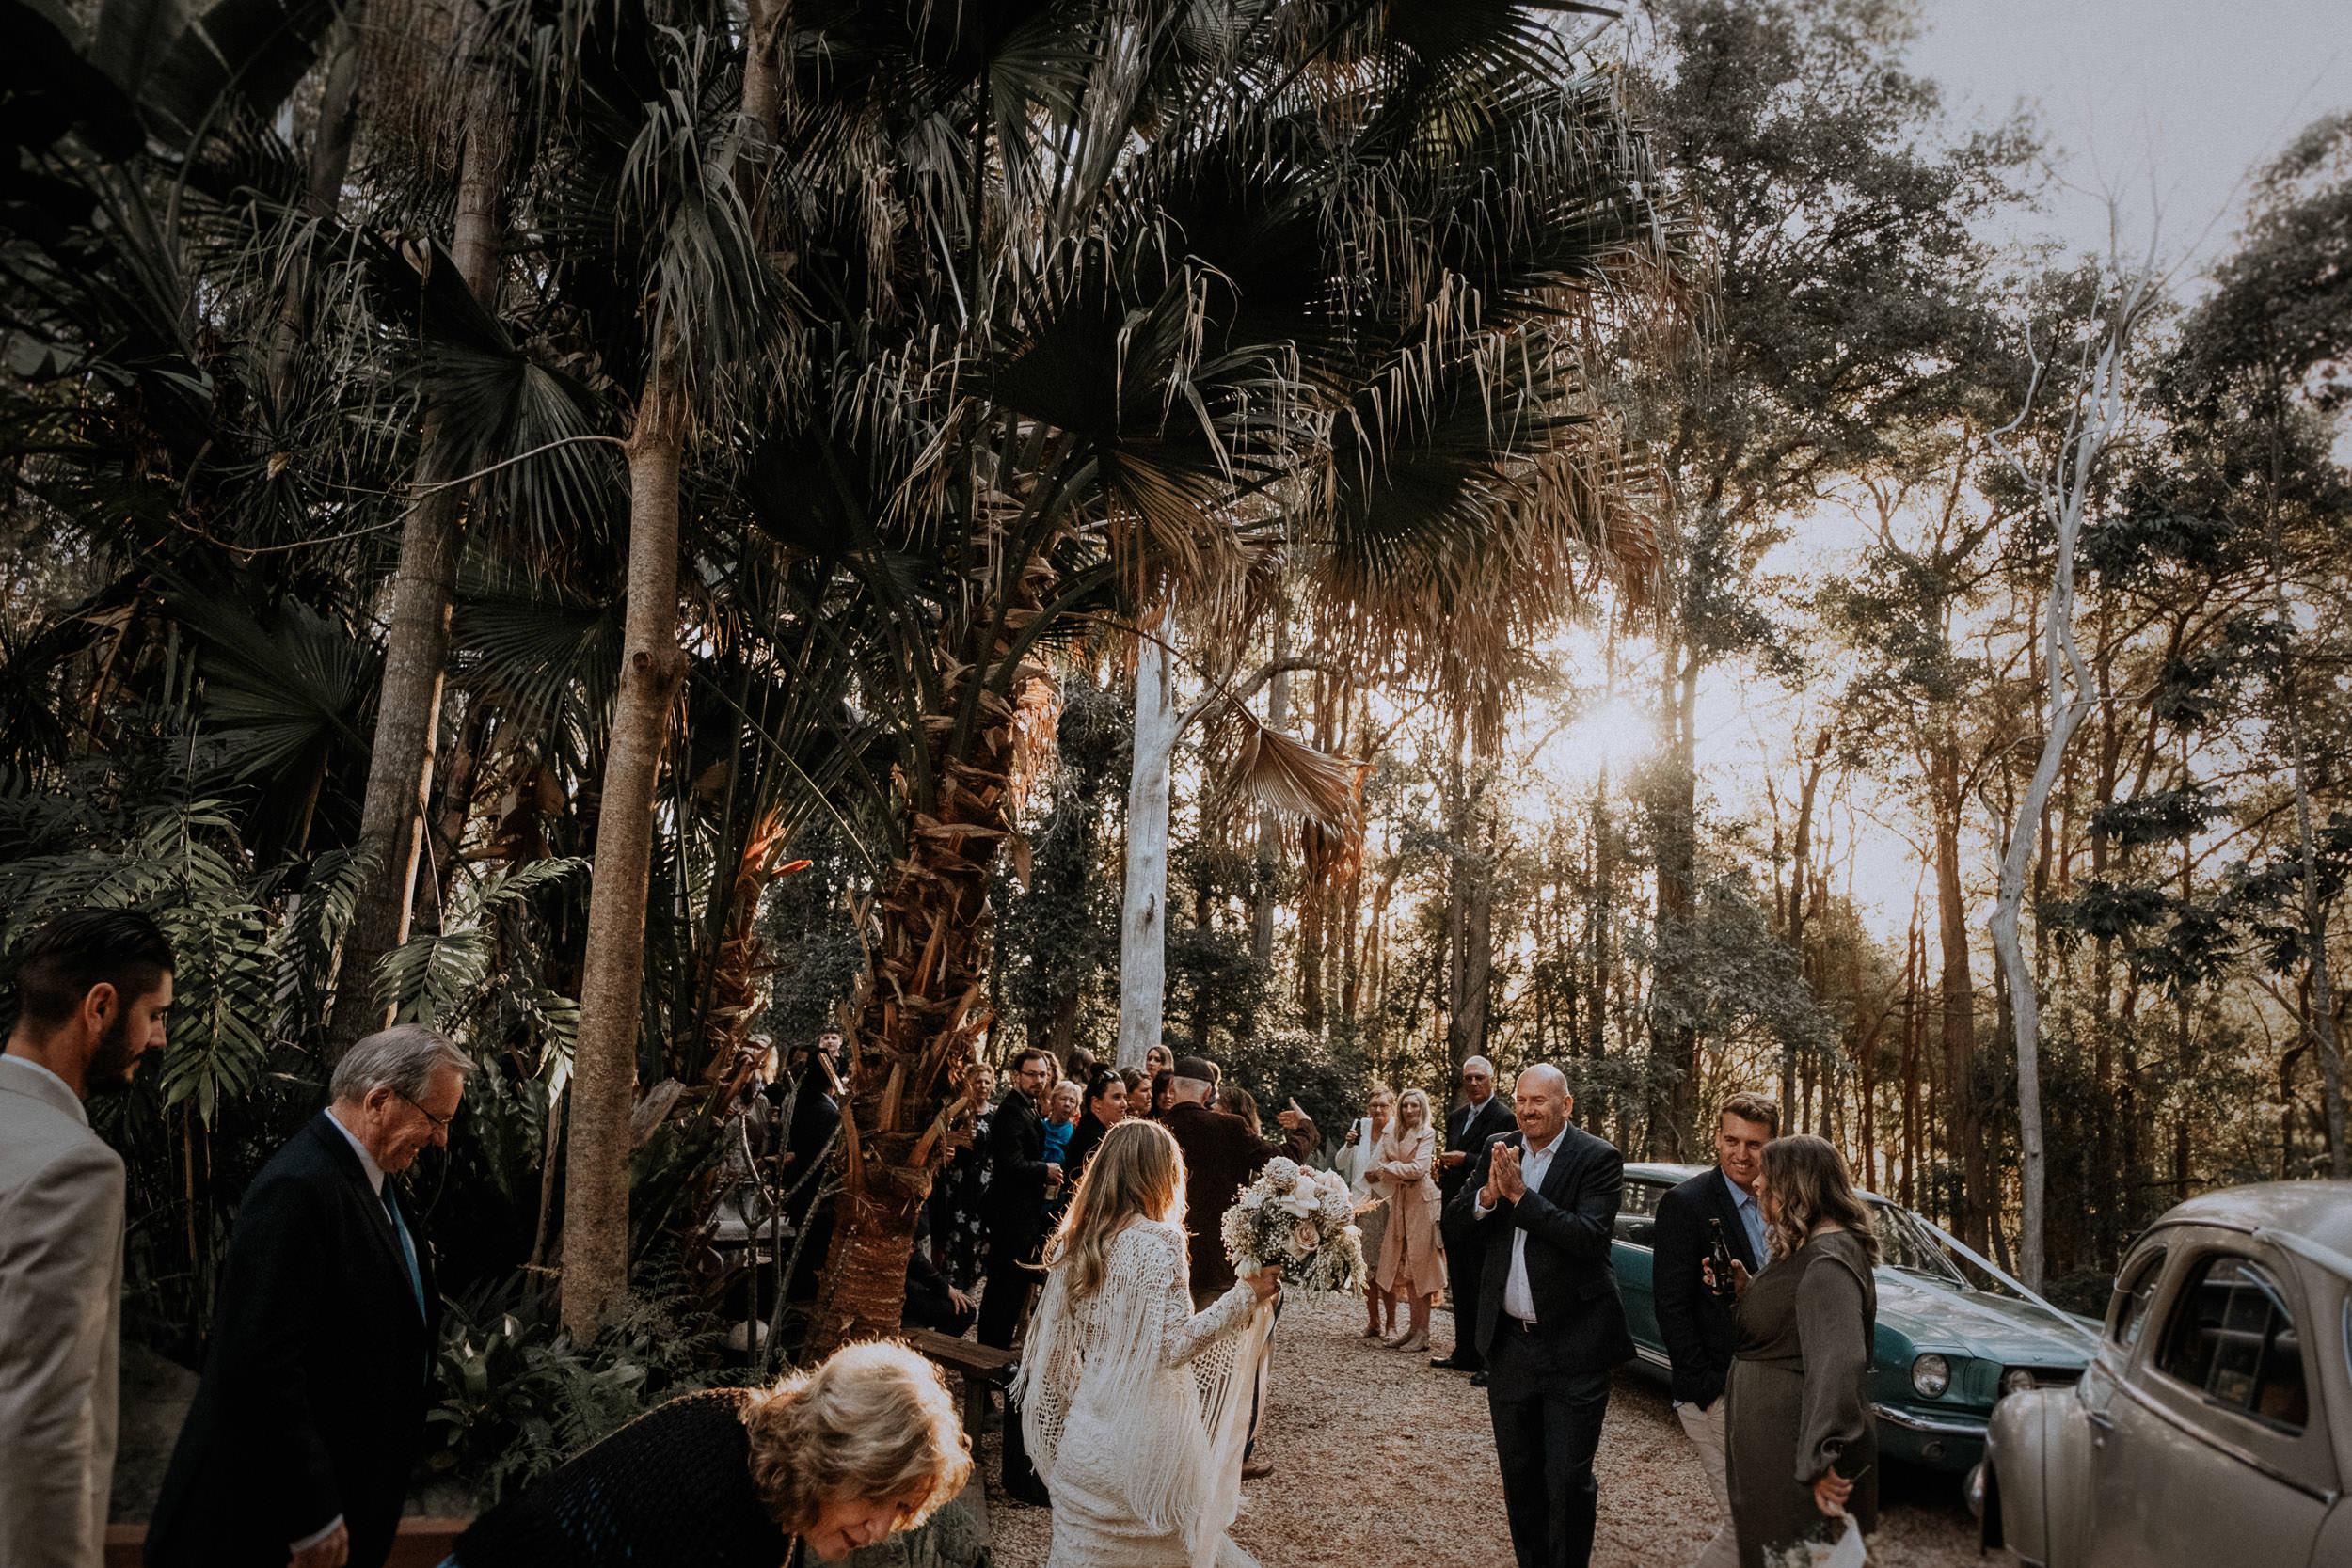 S&A Elopement - Kings & Thieves - Shred 'Til Dead - Central Coast Beach Forest Wedding - 325.jpg